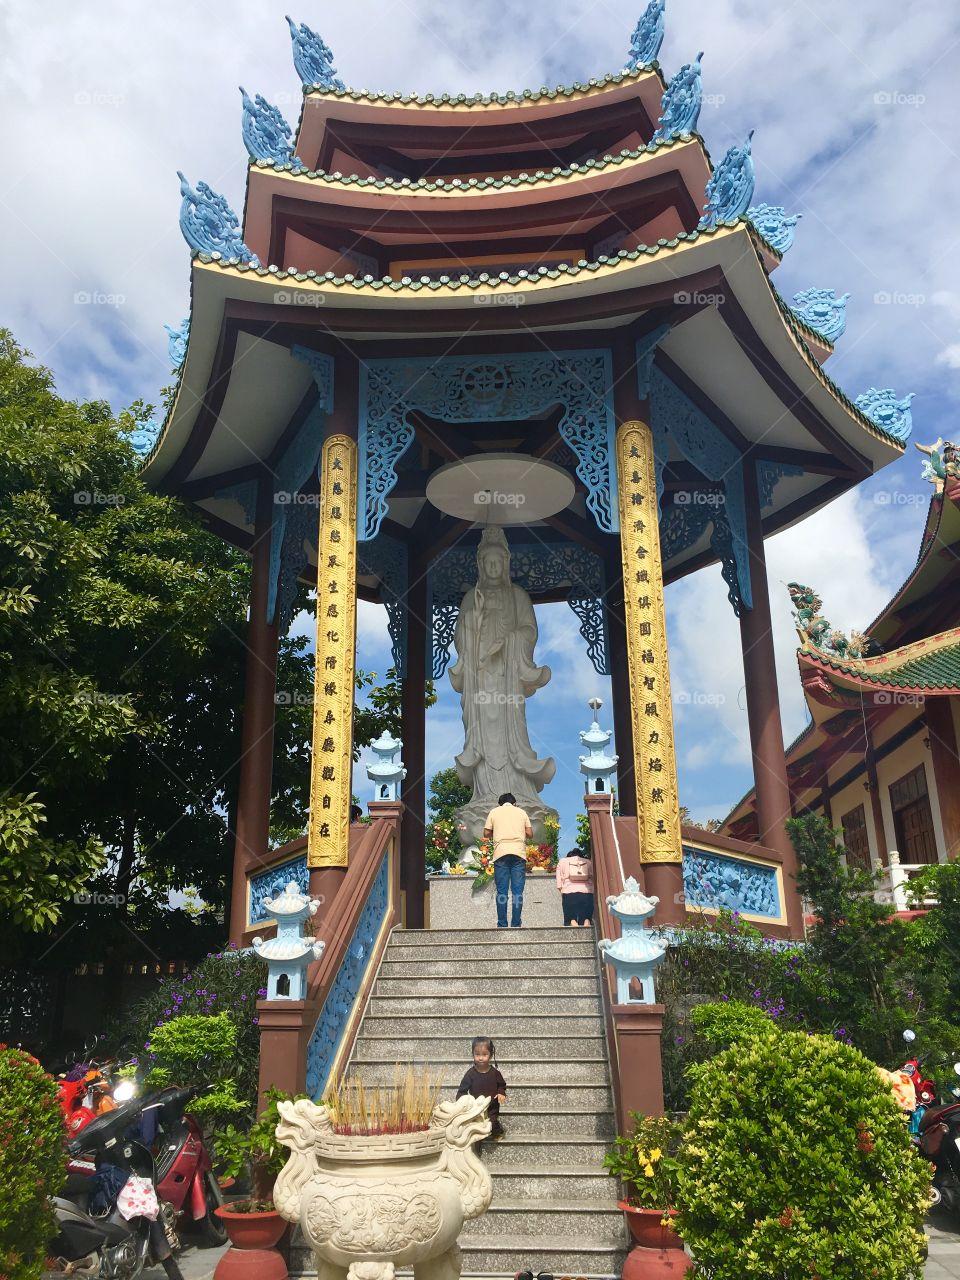 Architecture, Travel, No Person, Temple, Traditional